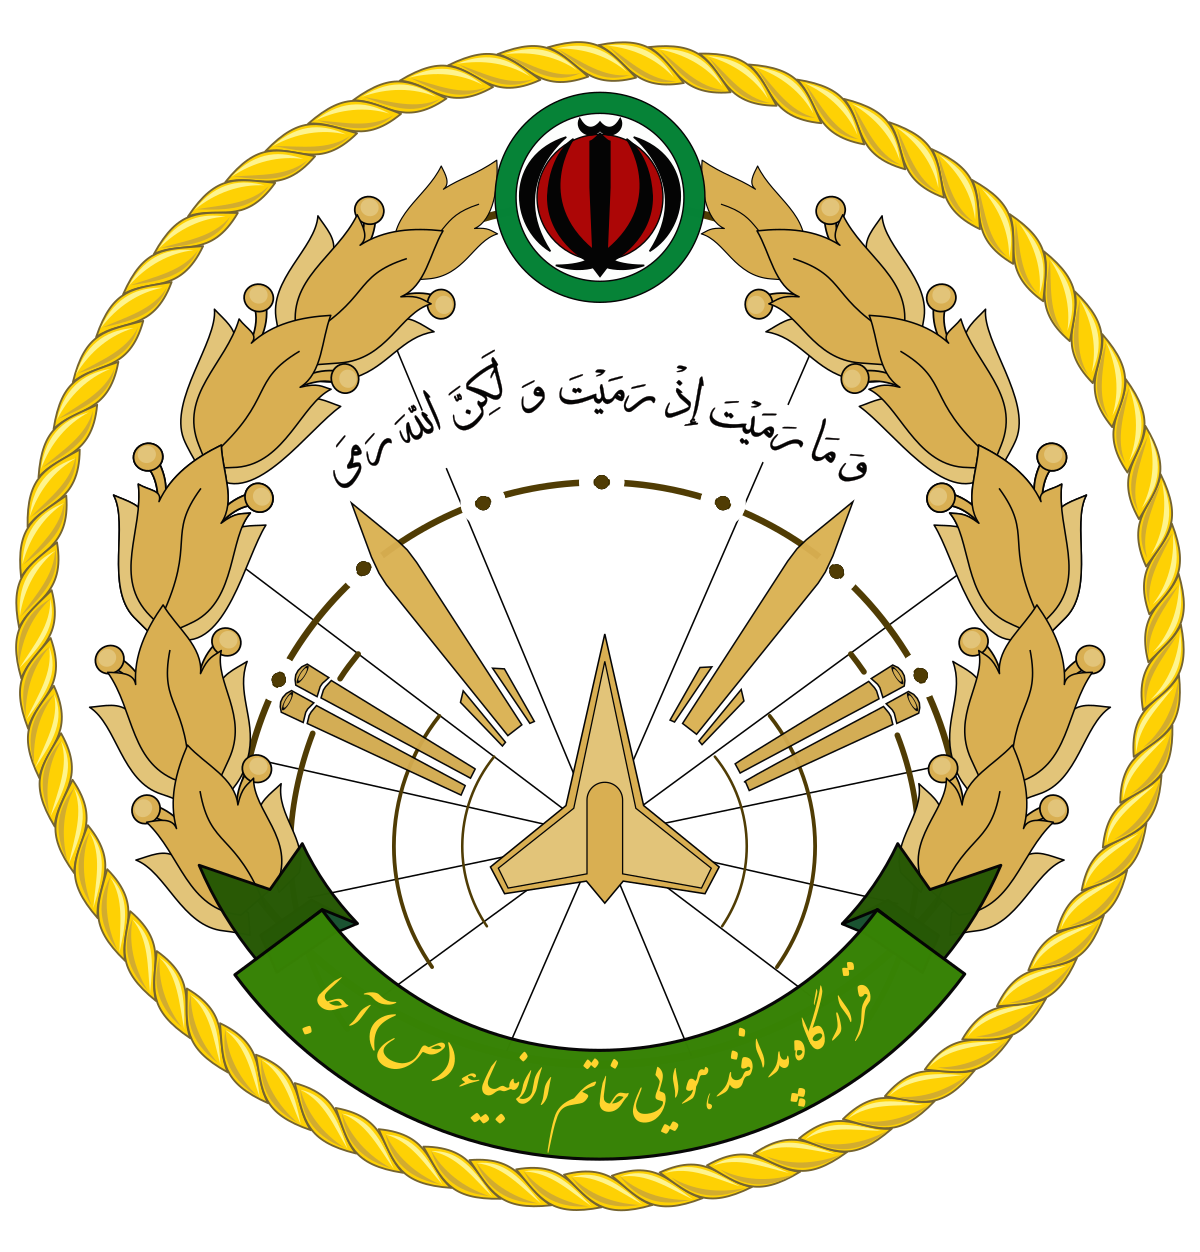 Islamic Republic of Iran Air Defense Force.